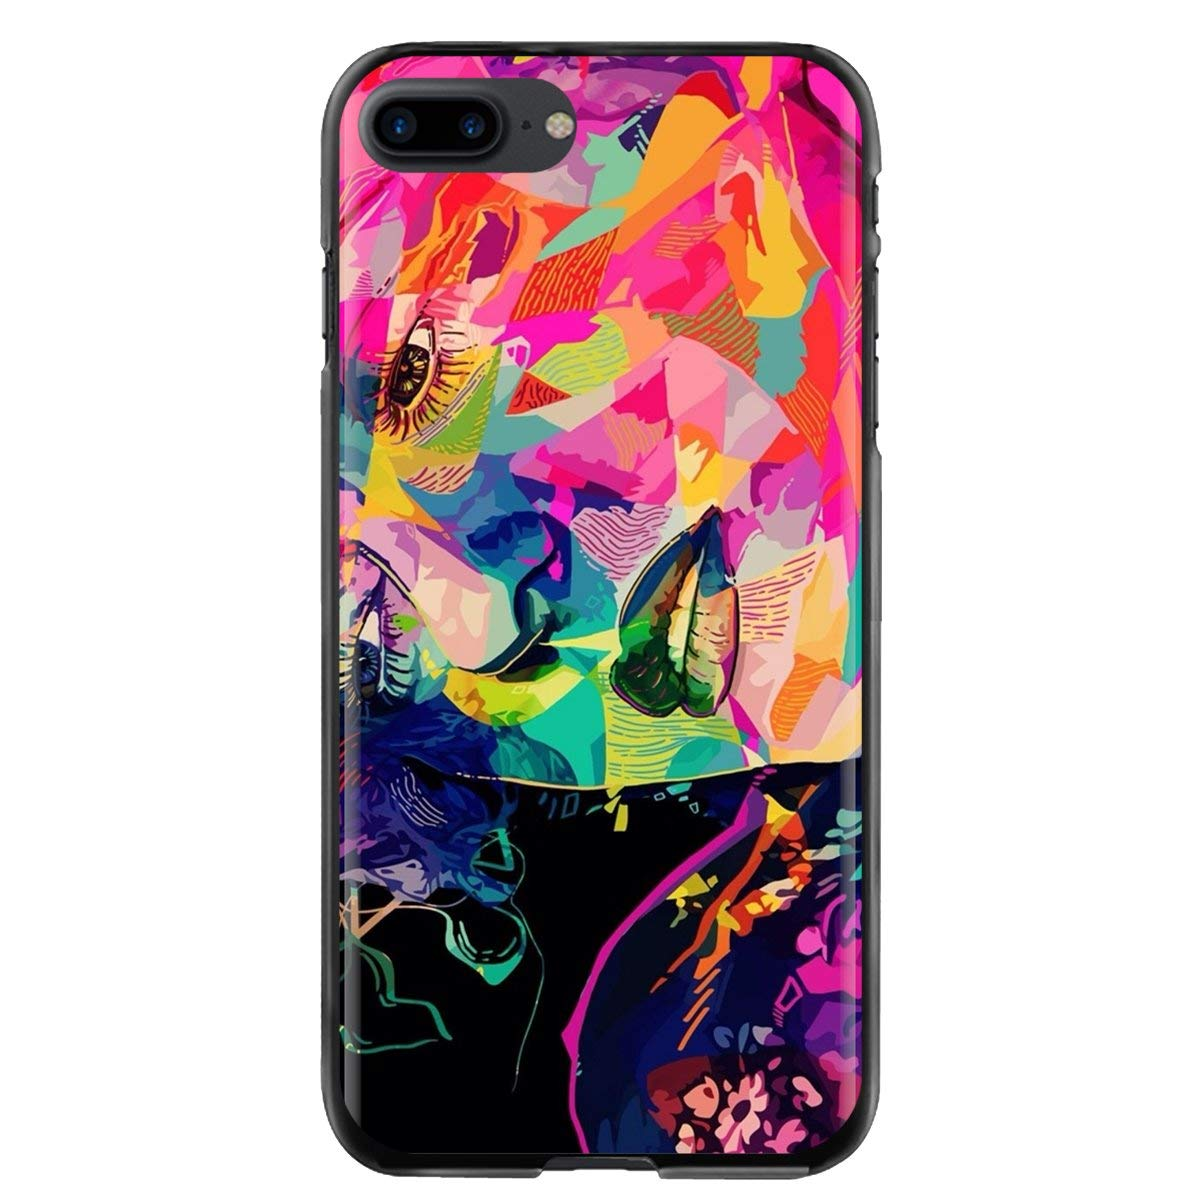 Iphone 6 Wallpaper Trippy Art - HD Wallpaper